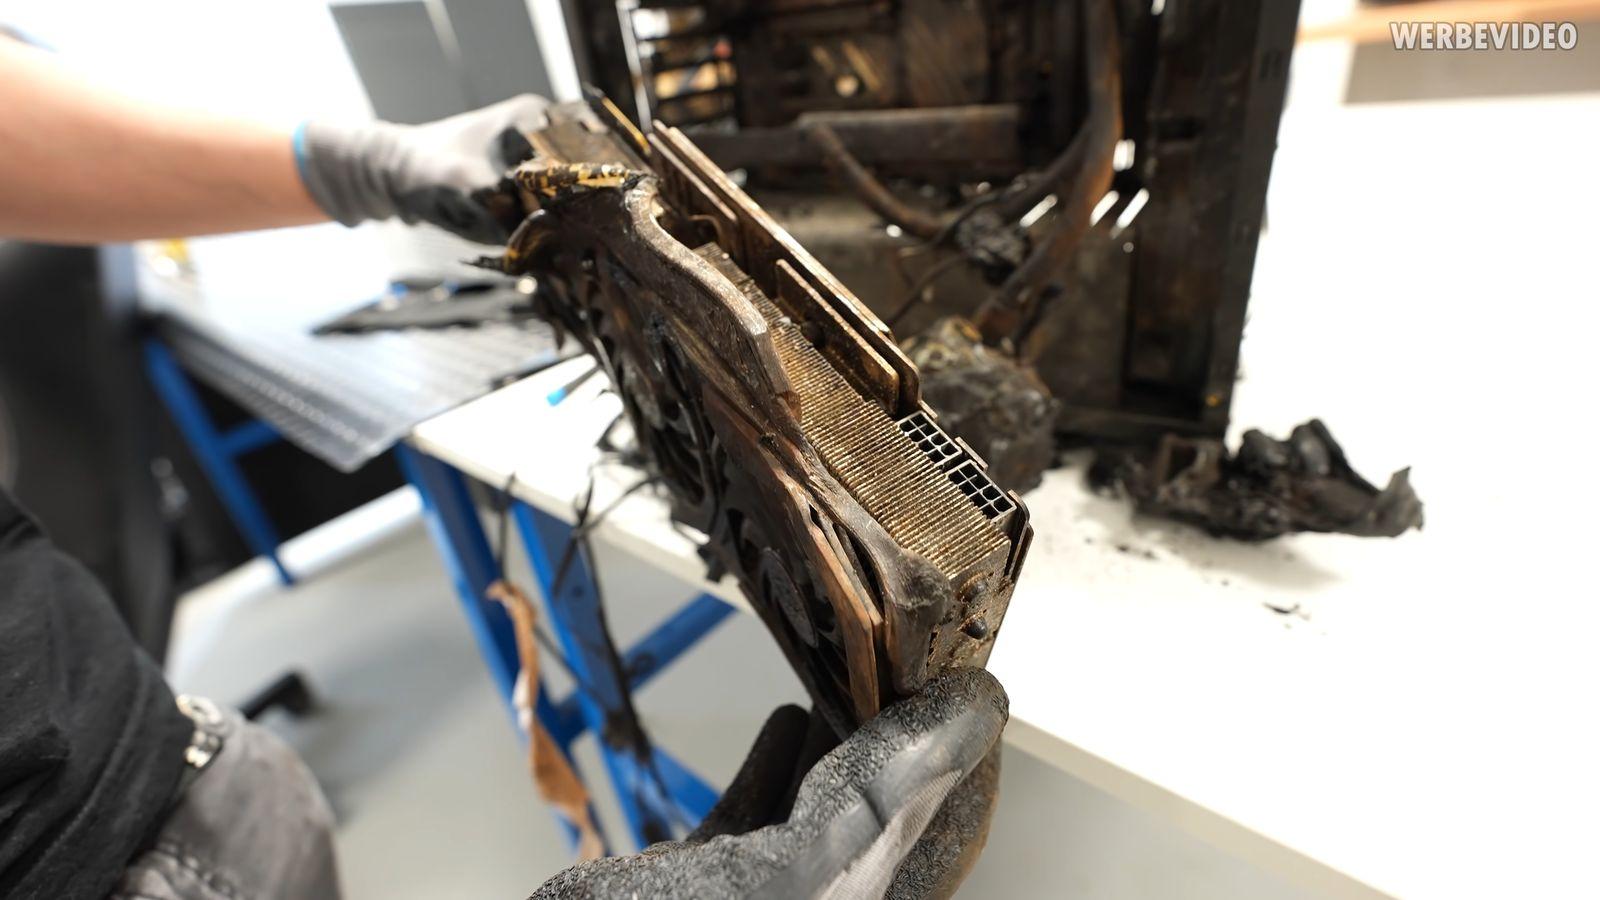 der8auer rtx 2070 super fire 12 videocardz สุดยอดความทน!!! การ์ดจอ MSI RTX 2070 SUPER GAMING ถูกไฟไหม้ยับแต่ยังเปิดติดเข้าวินโดว์ได้หน้าตาเฉย